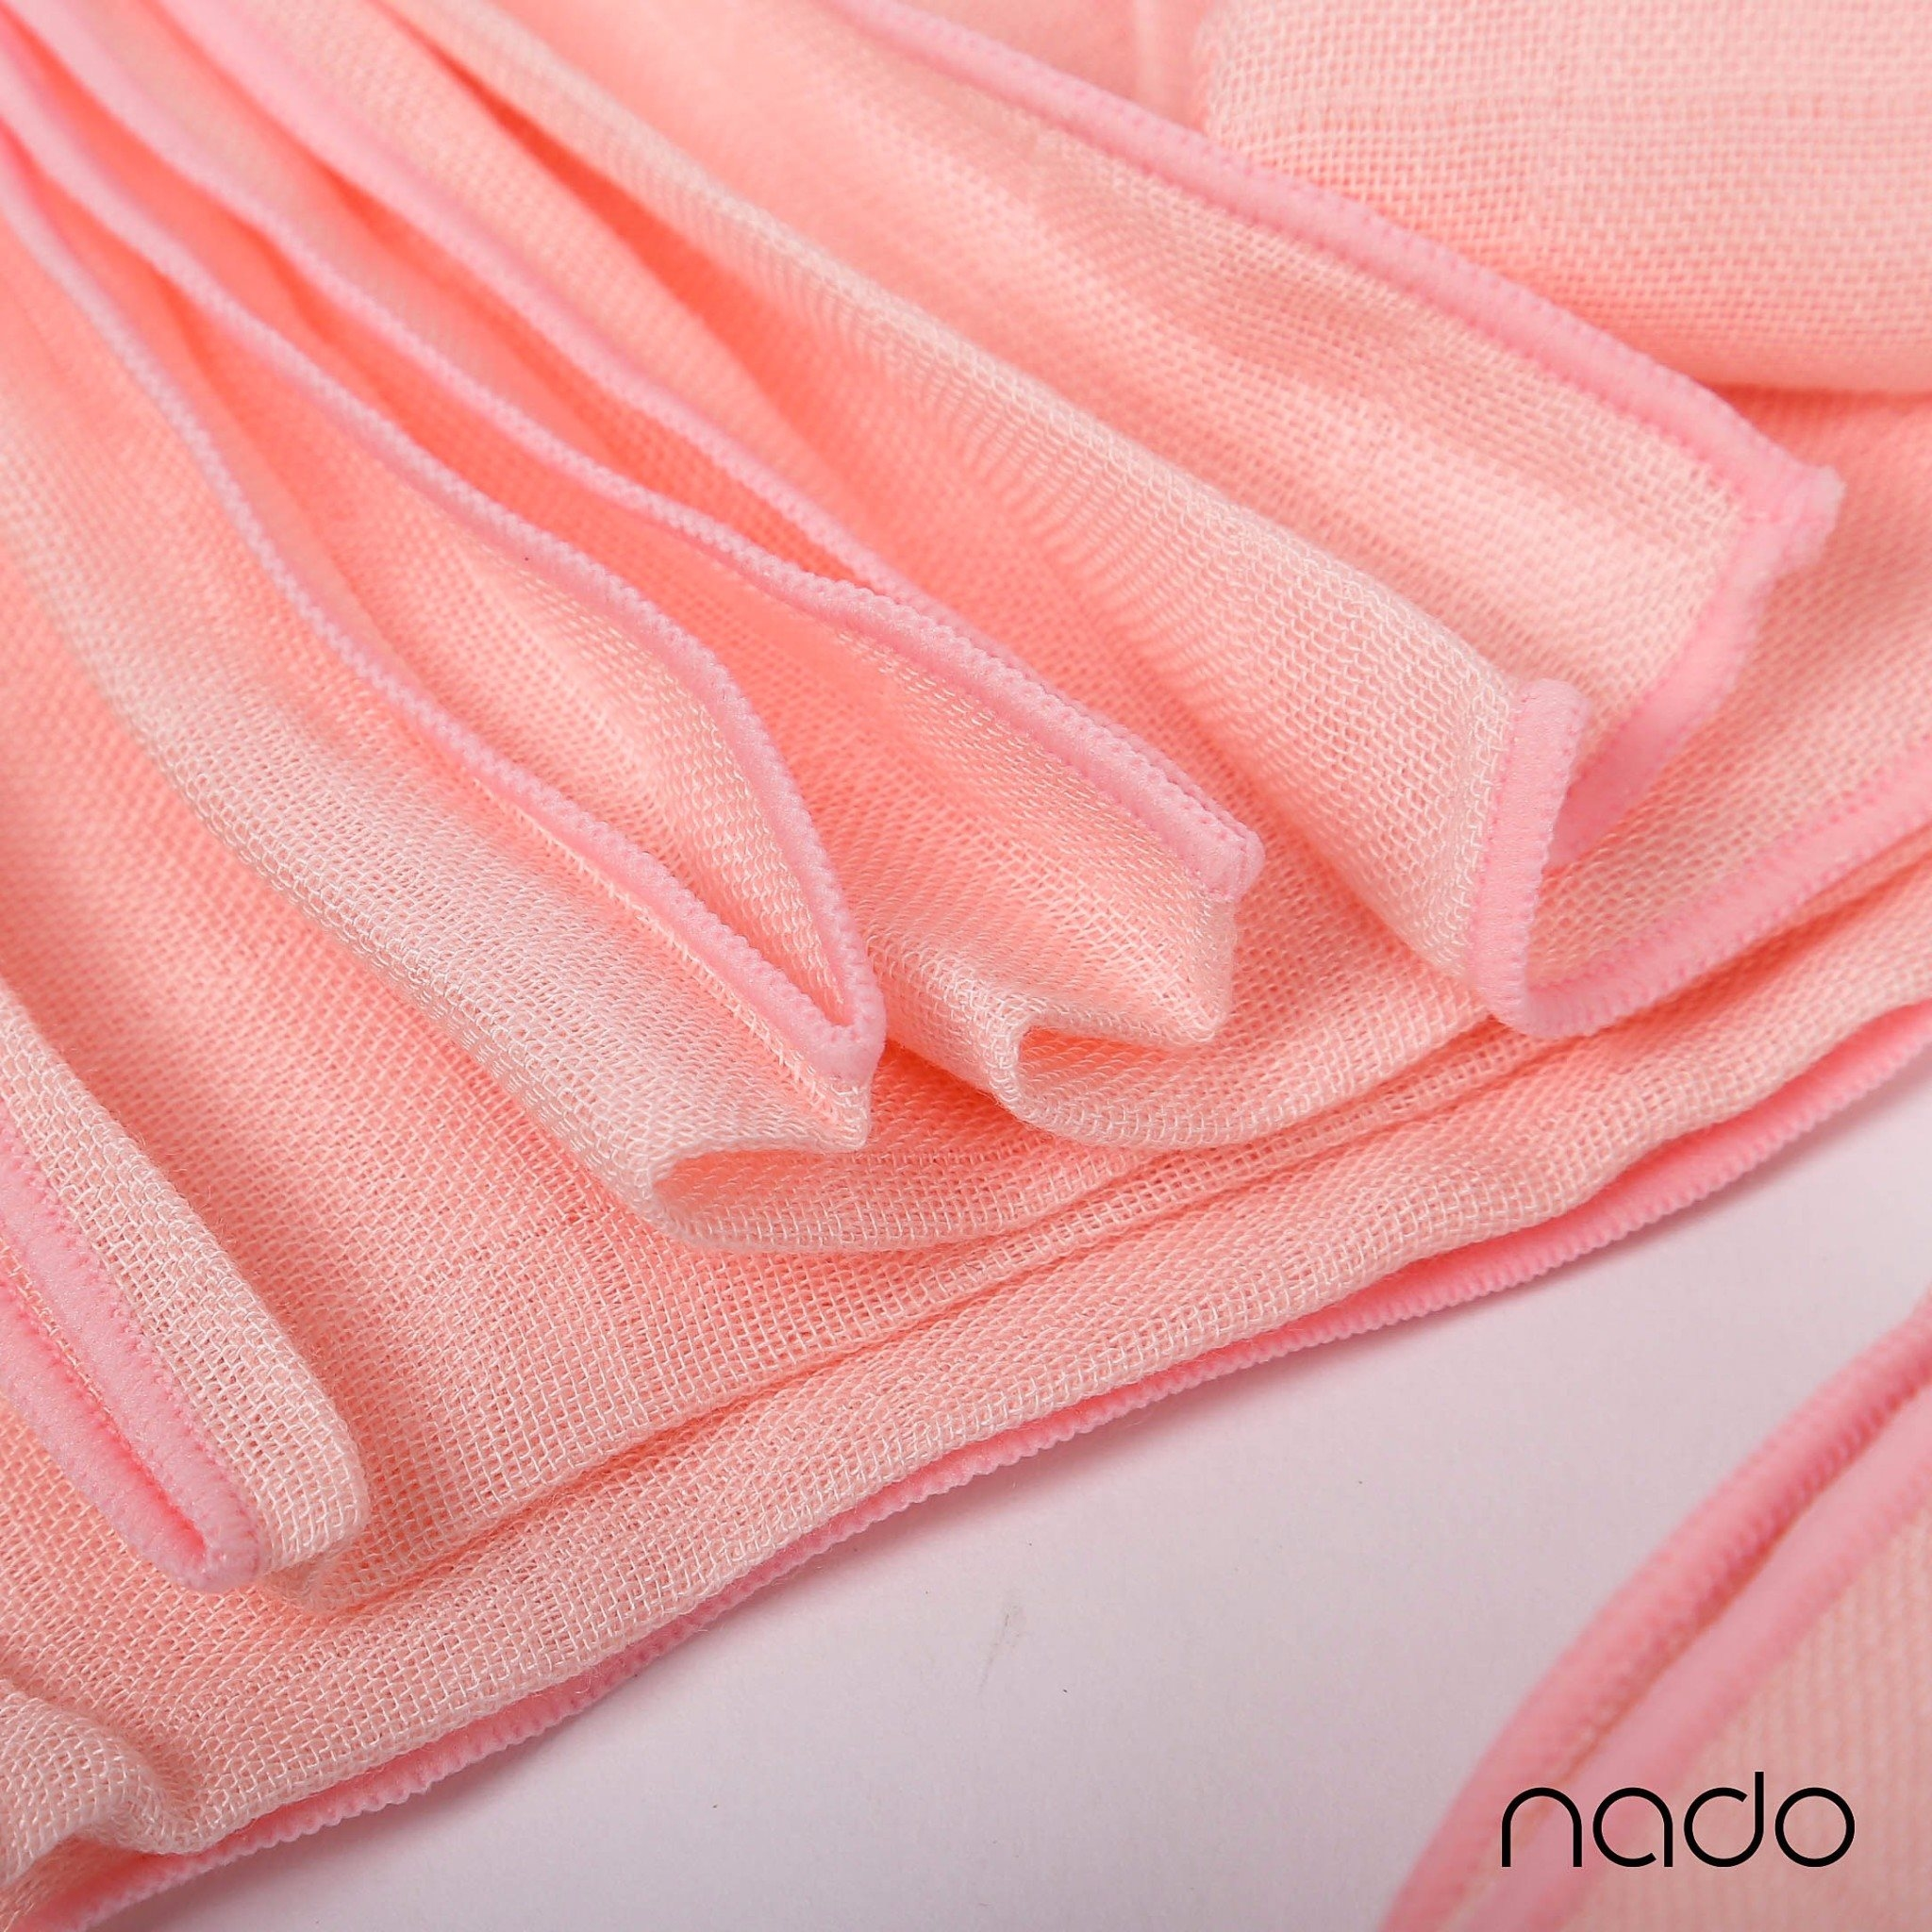 Set 2 khăn sợi tre Nappi màu hồng 77*77 cm